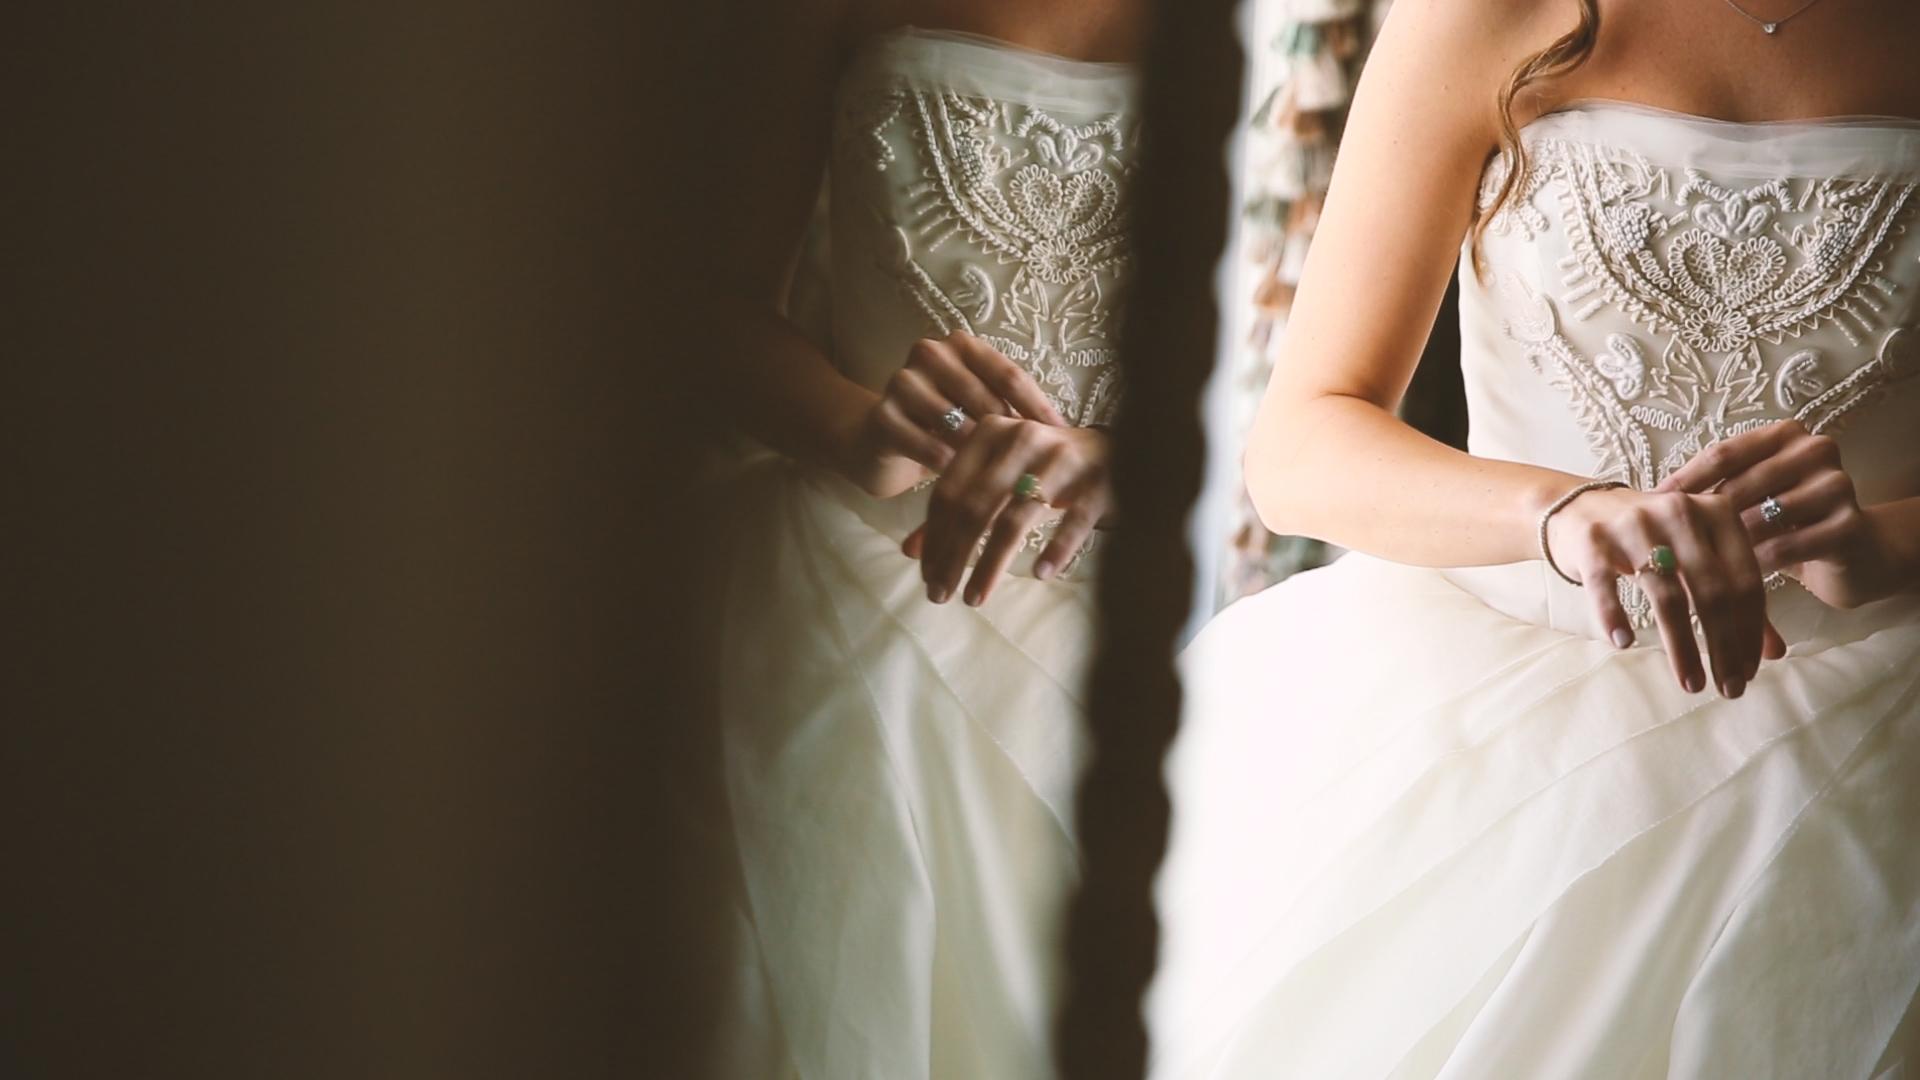 Bracelet - Bride Film